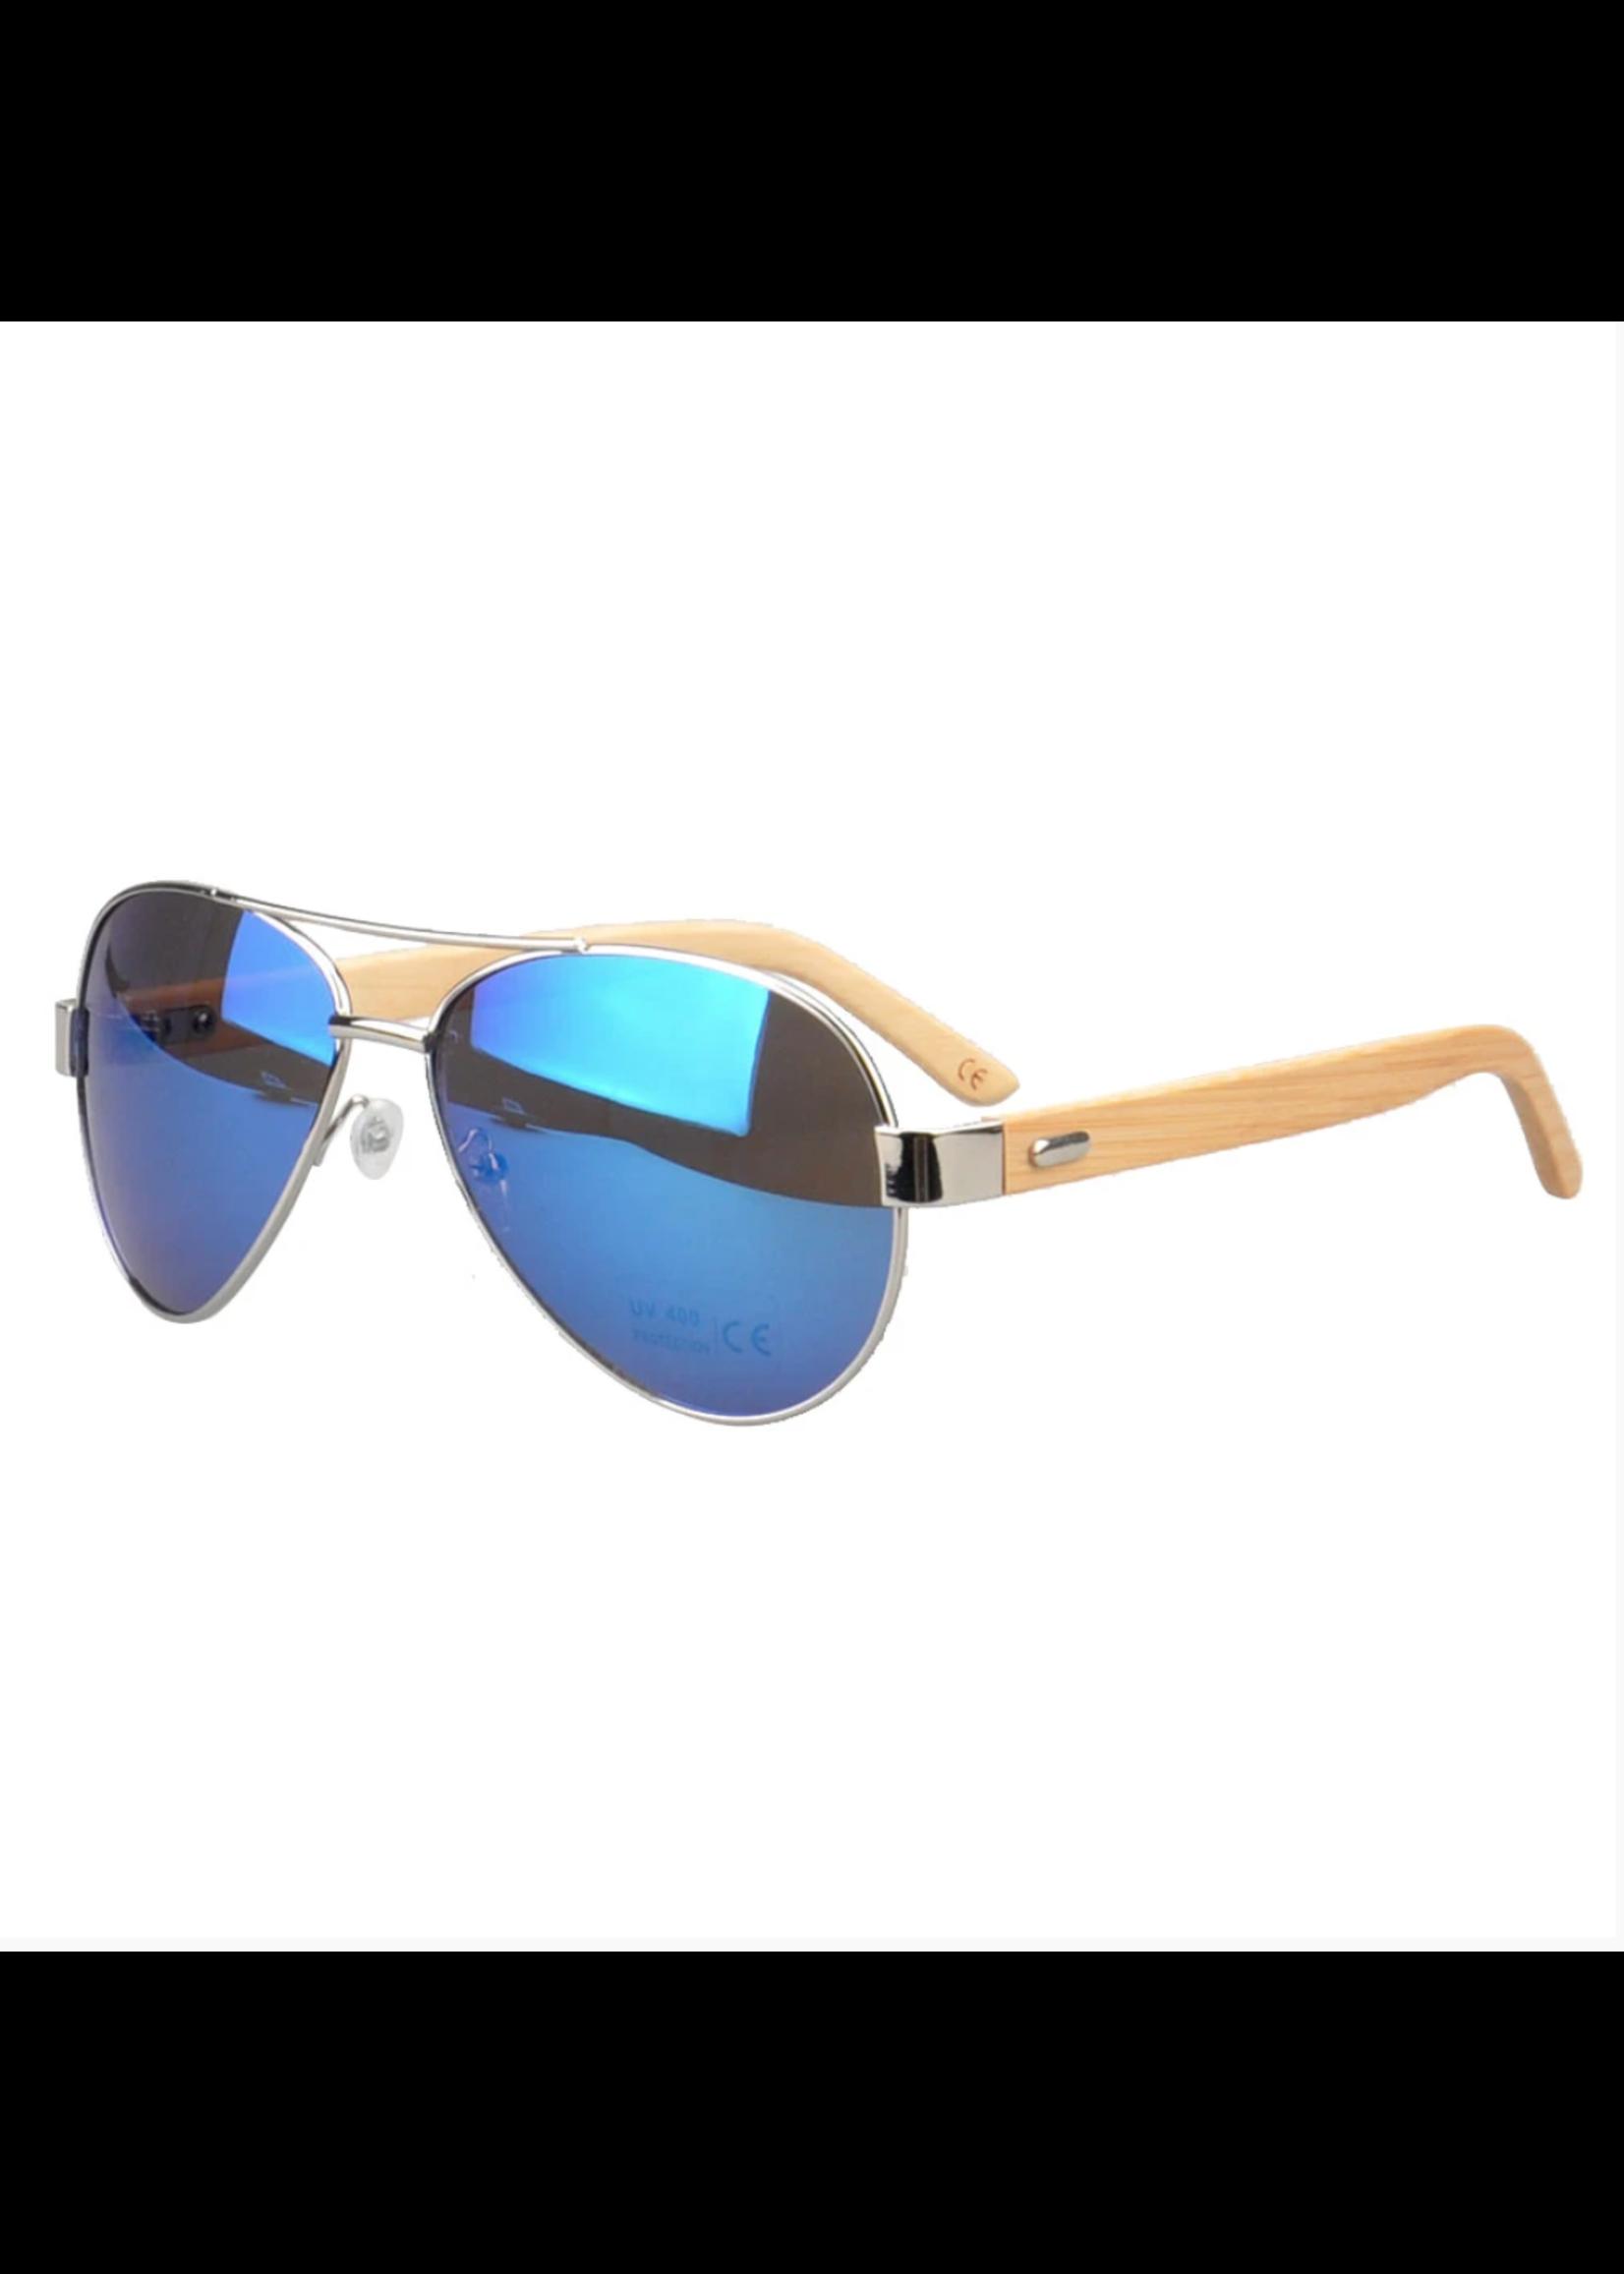 Kuma Sunglasses Jacaranda - Mirrored Blue